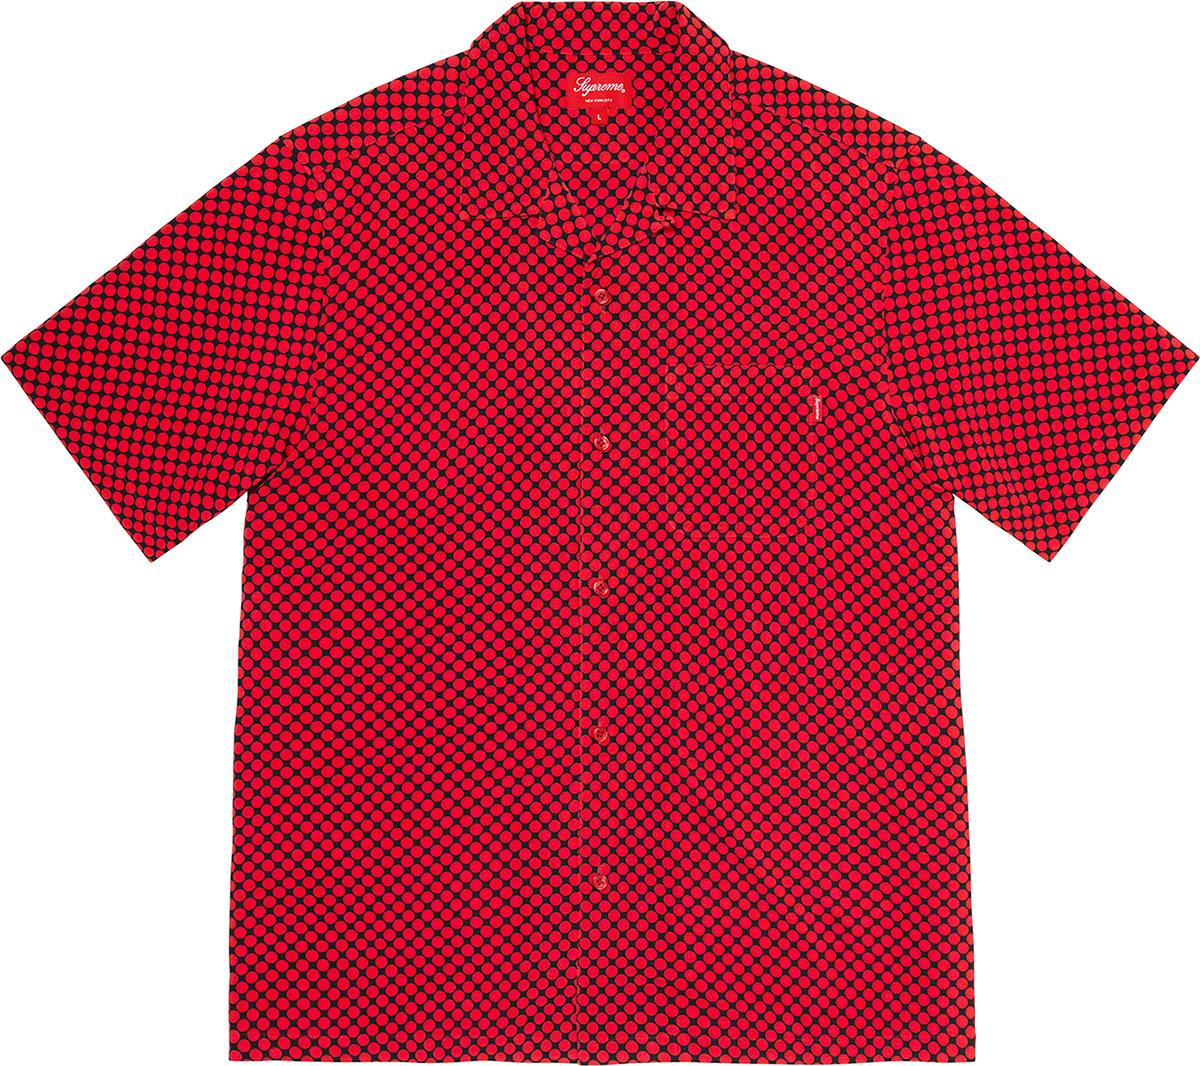 Supreme 2020fw Compact Dot Rayon SS Shirt シュプリーム コンパクト ドット レーヨン シャツ レッド